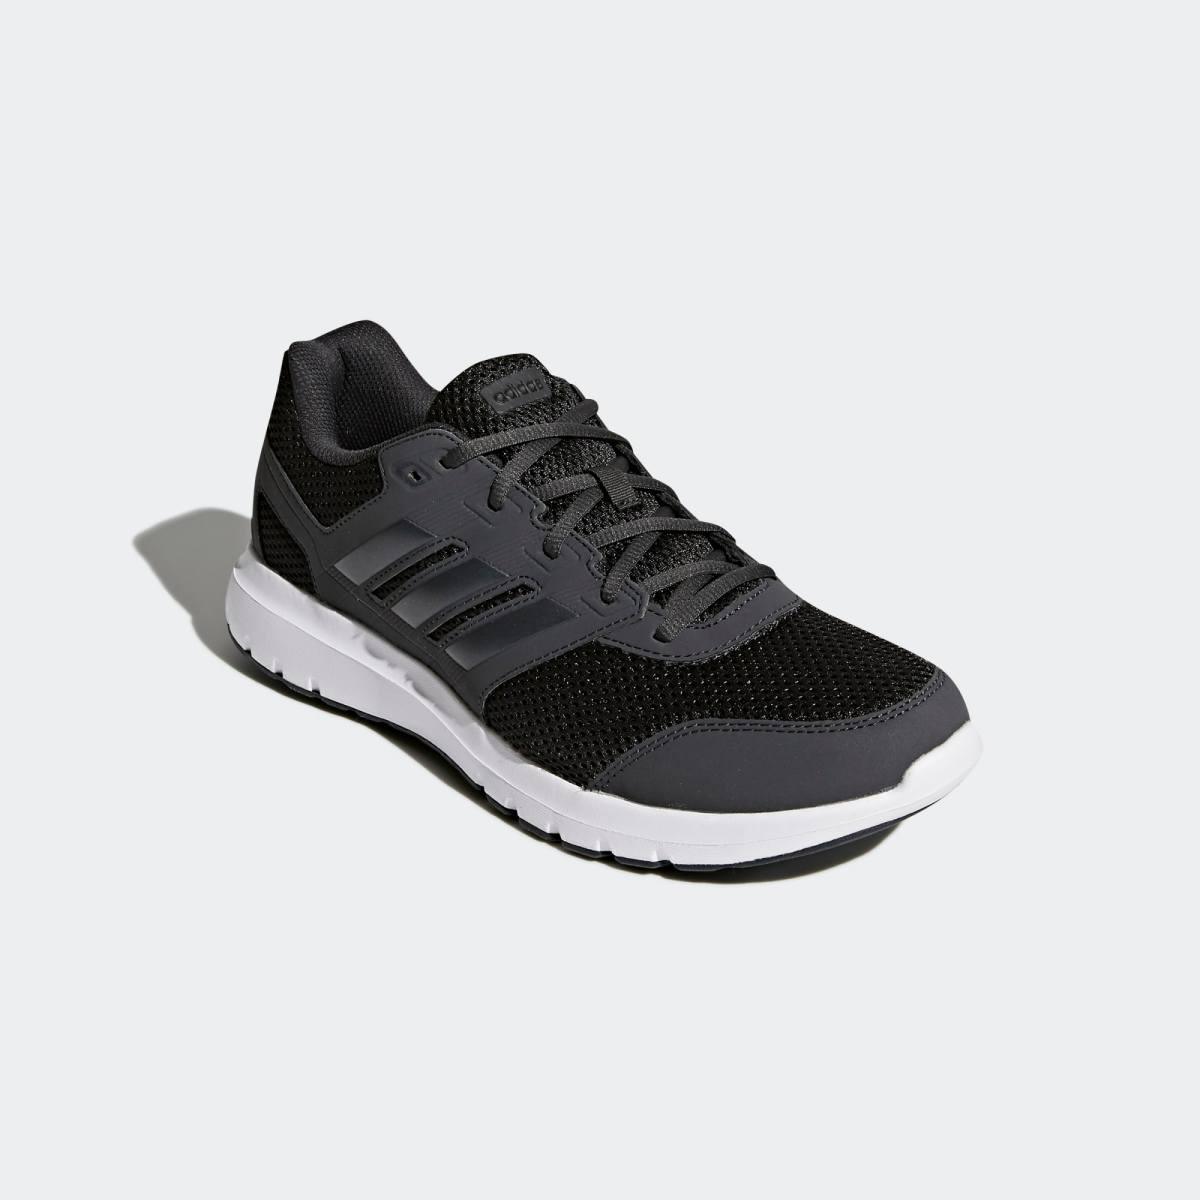 Chaussure_Duramo_Lite_2.0_Gris_CG4044_04_standard